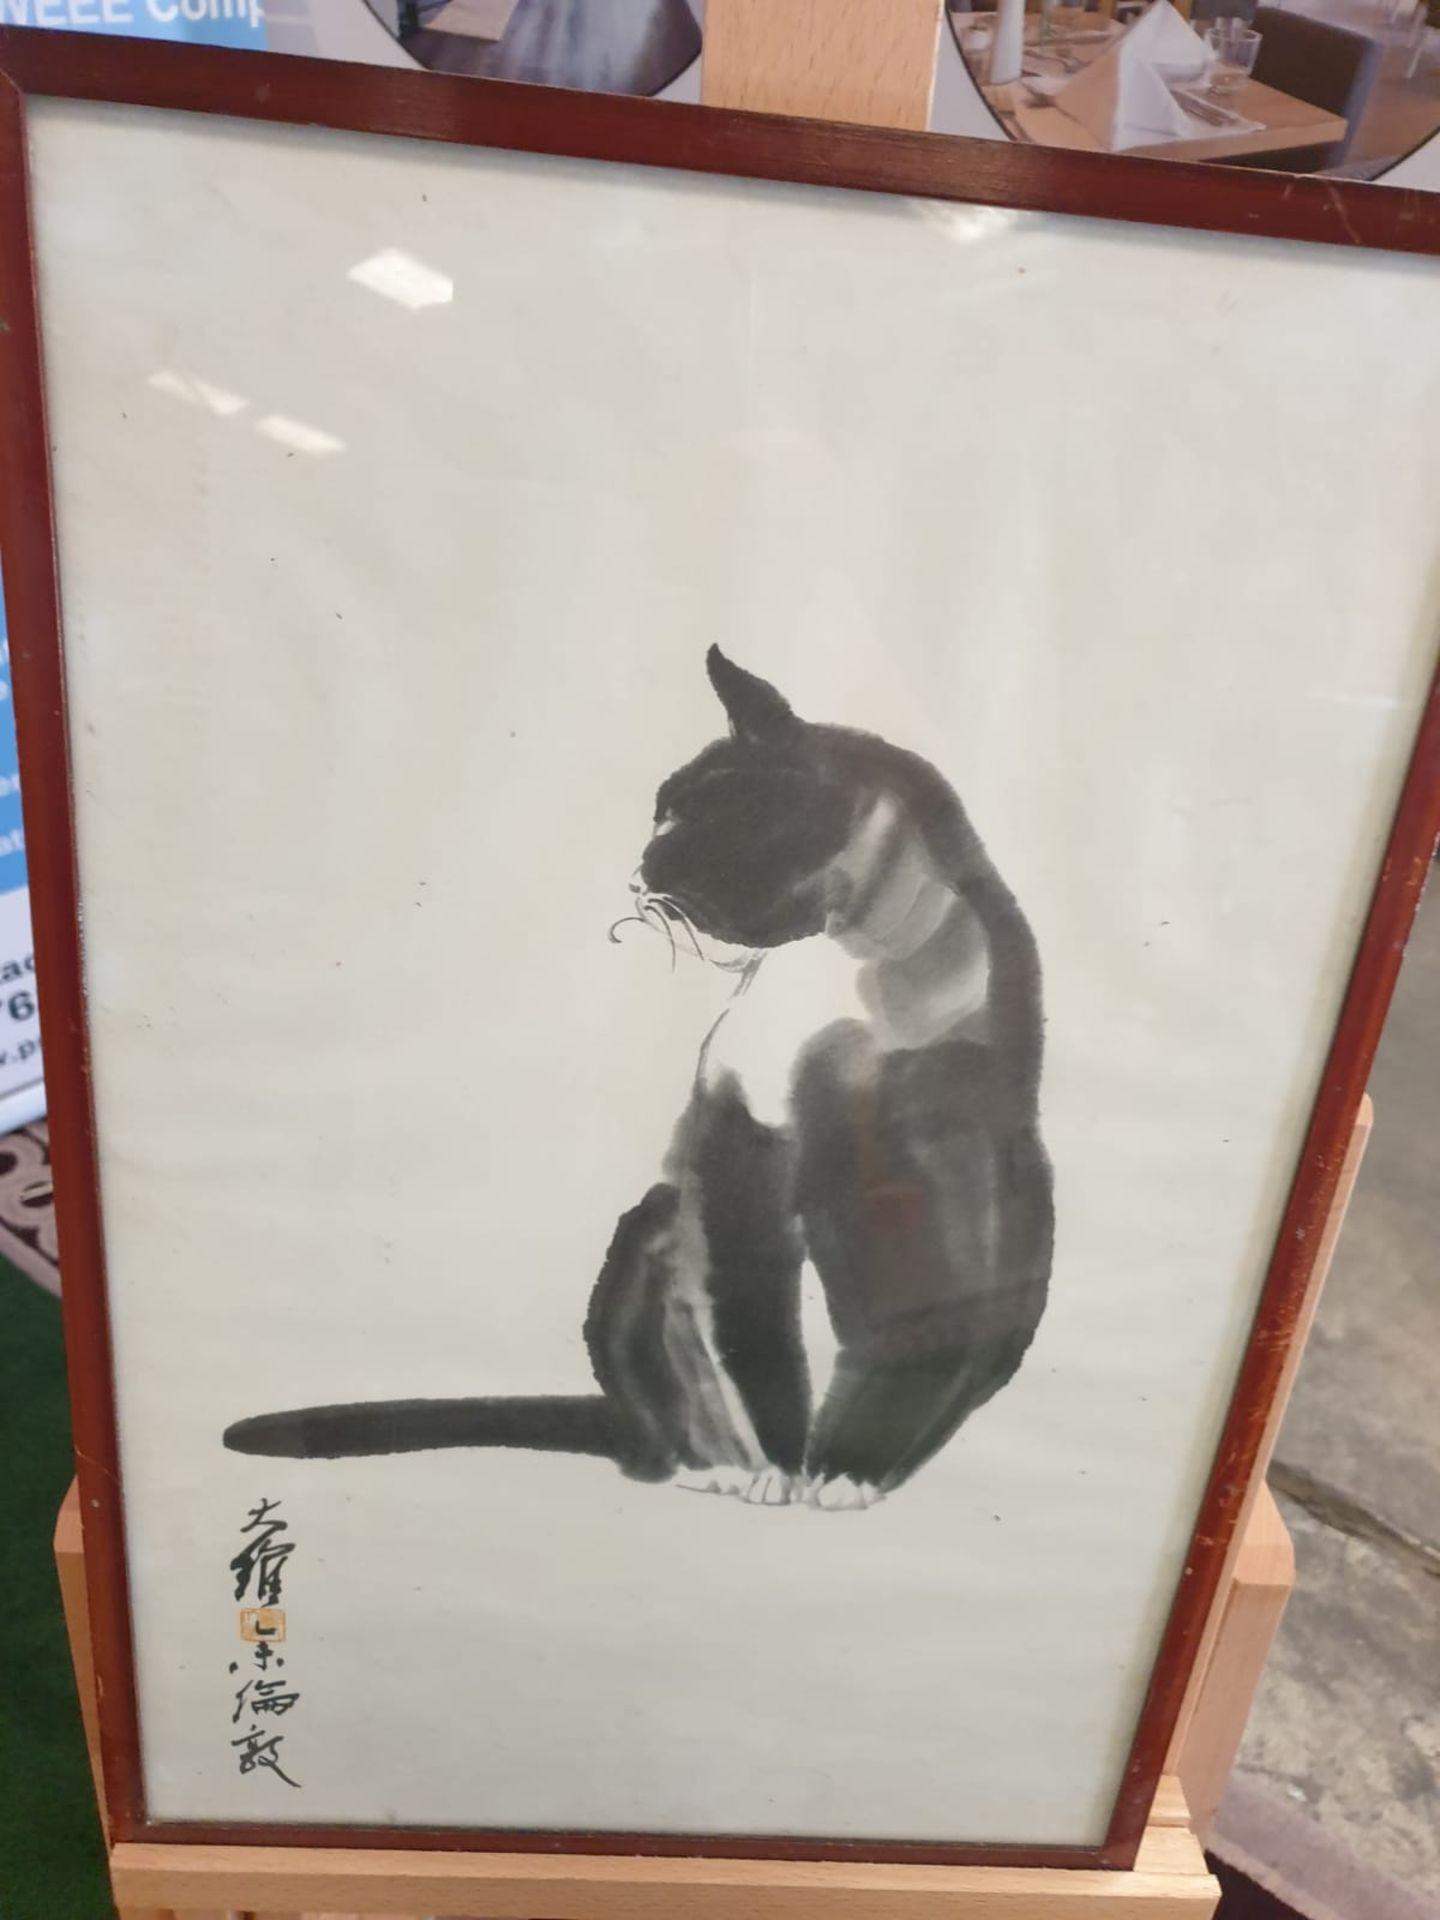 David Kwo Da-Wei (1919-2003) Chinese Lithographic Print Black Cat - Kim Da Wei Kwo, David Kwo 1919- - Image 4 of 4